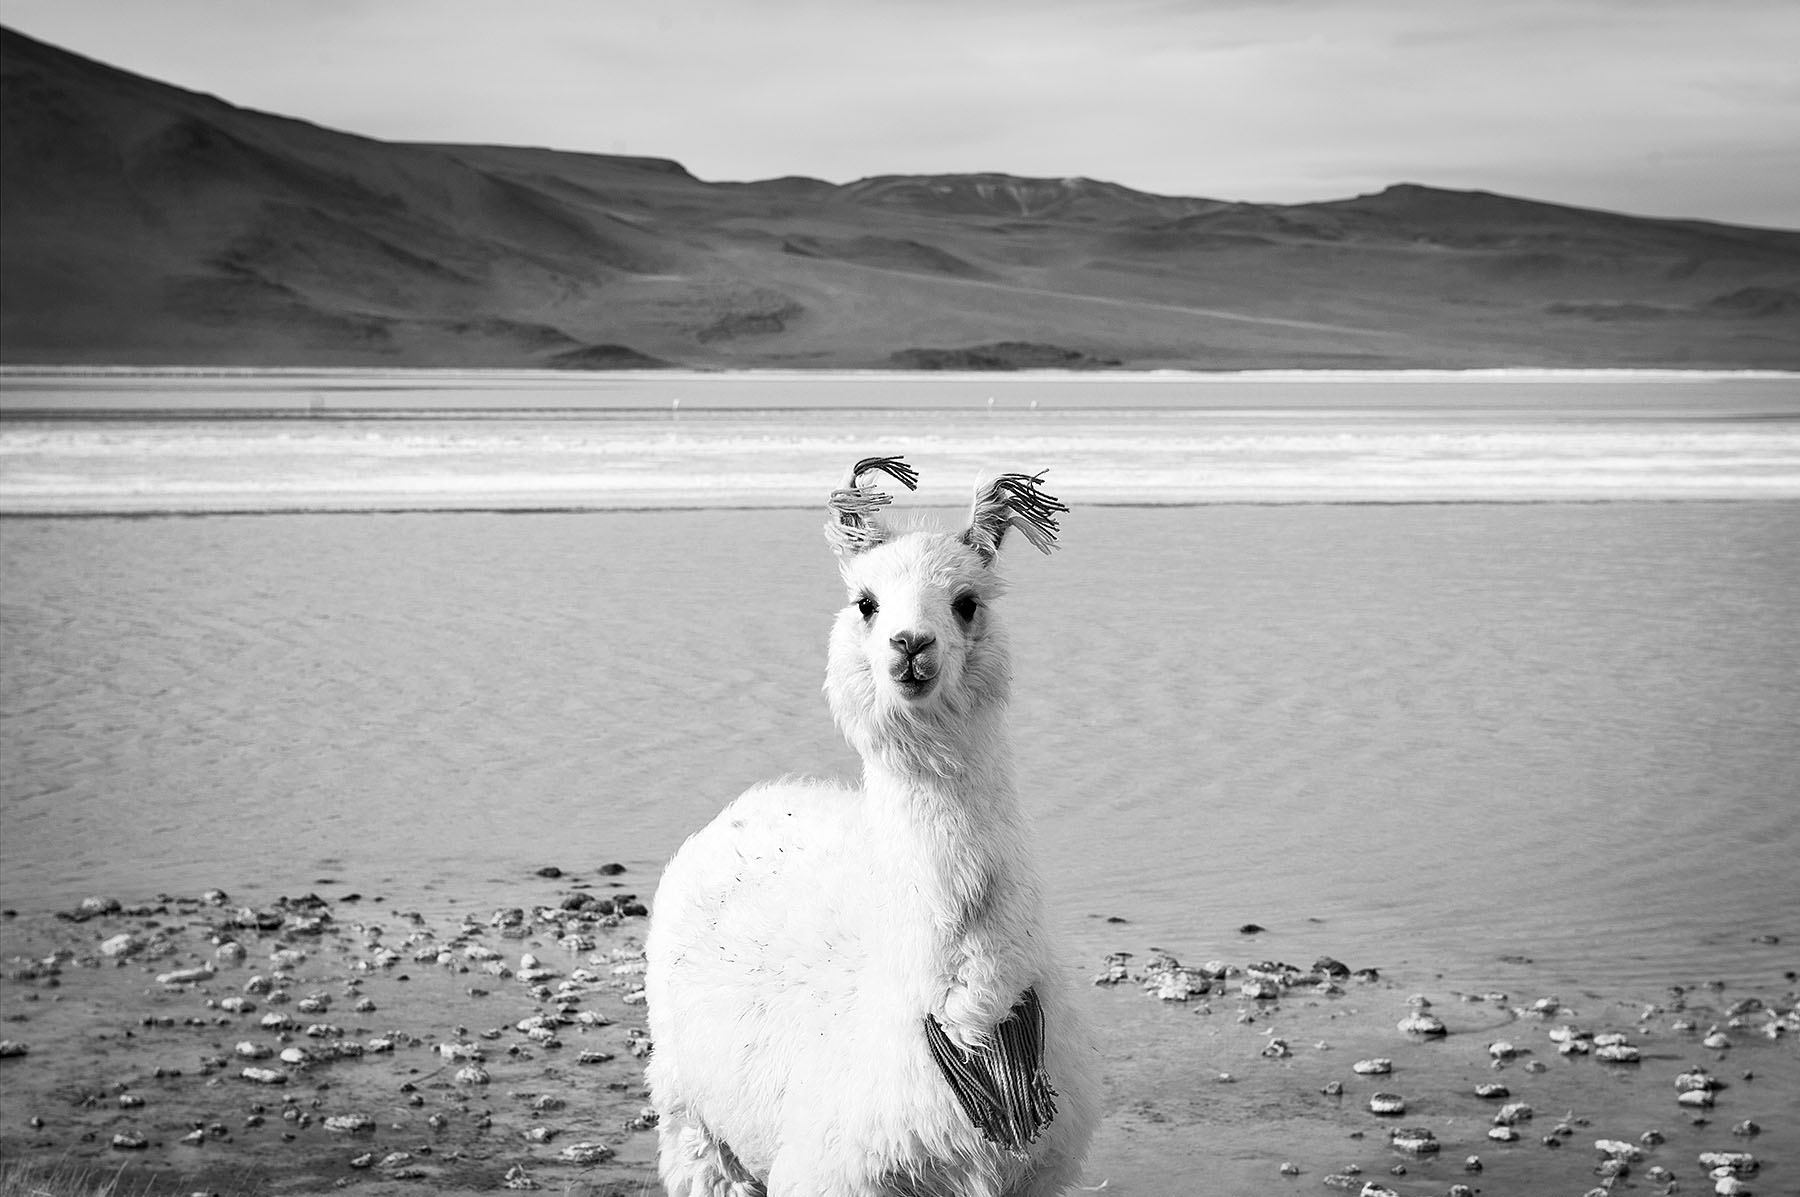 places_llama_natgeo_bw.jpg